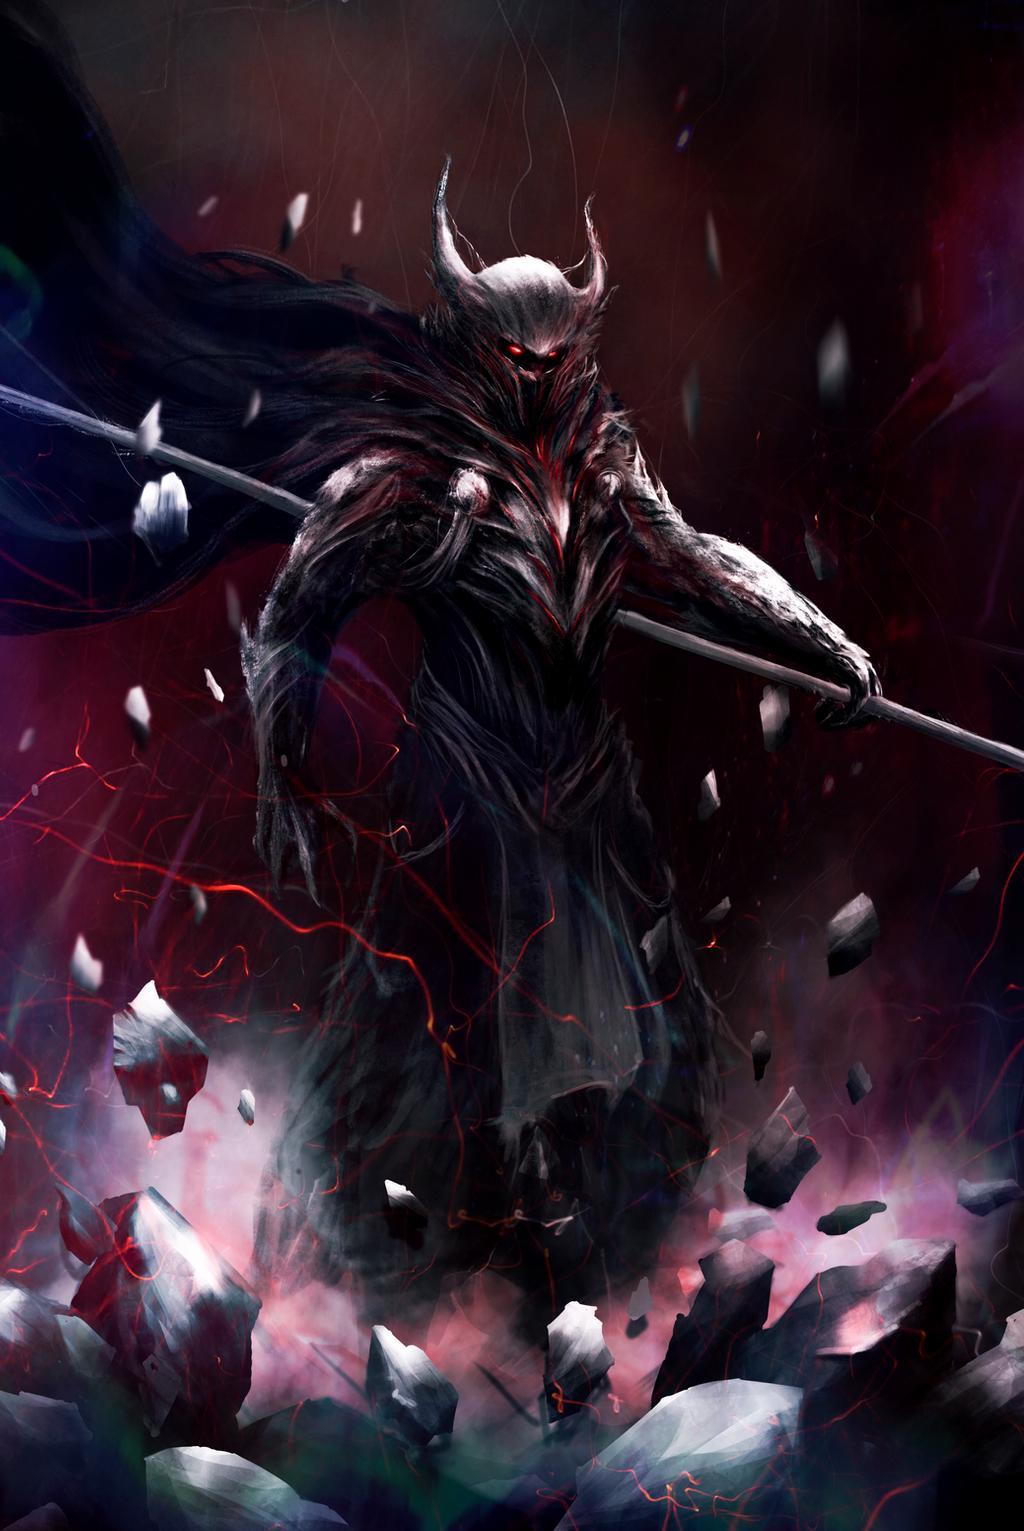 Galyan, the Blood Red Sandman